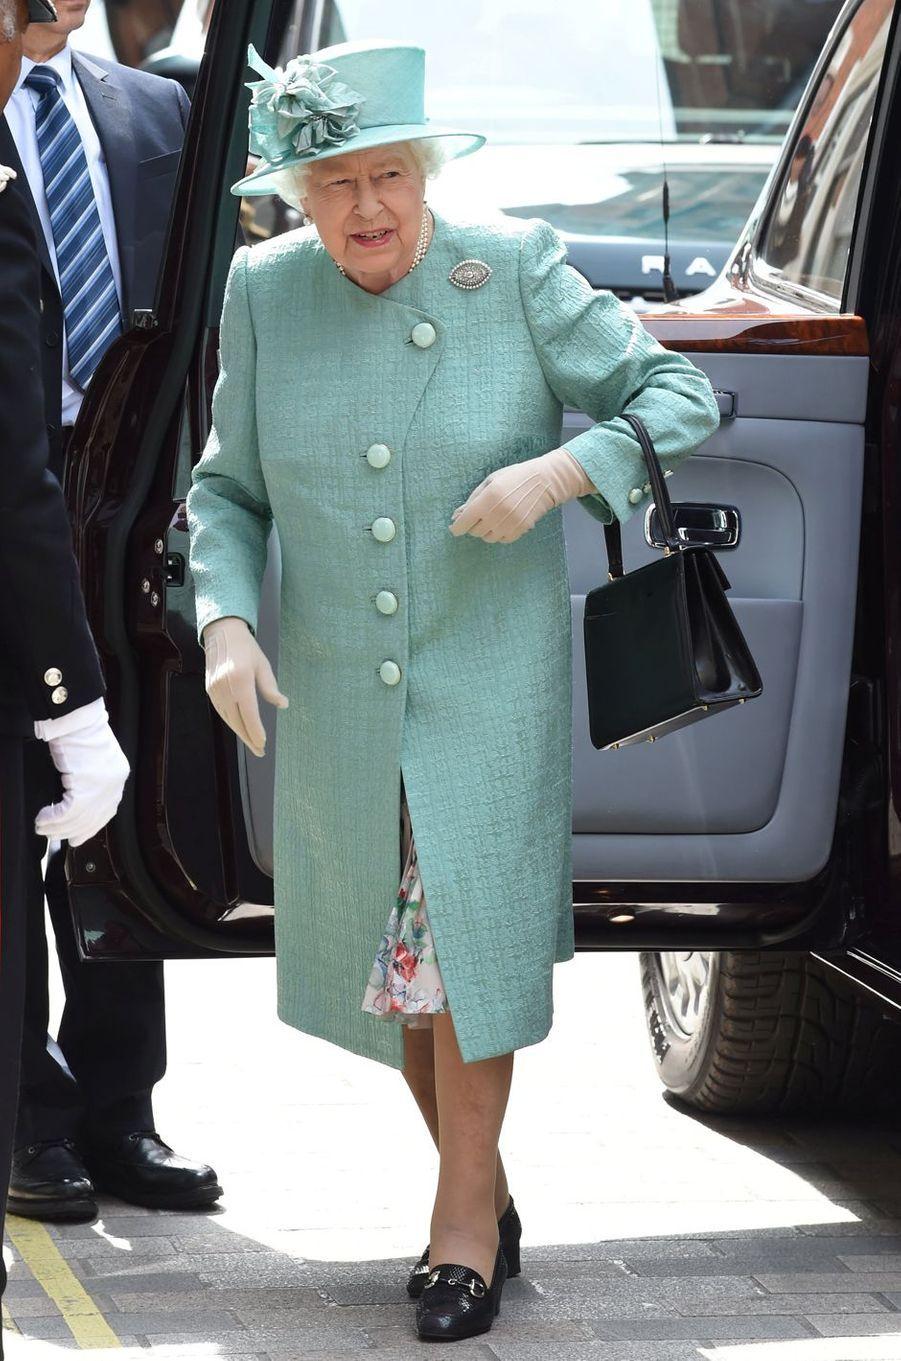 La reine Elizabeth II de sortie à Londres, le 22 mai 2019